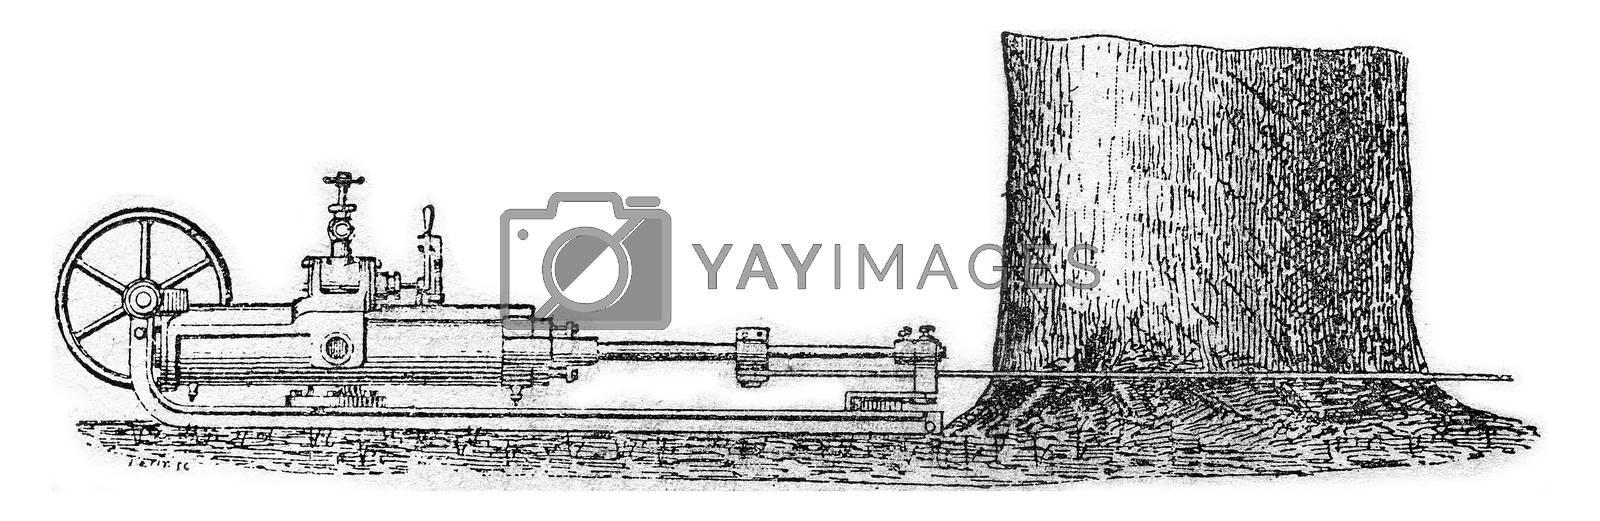 Saw the mechanical felling, vintage engraved illustration.